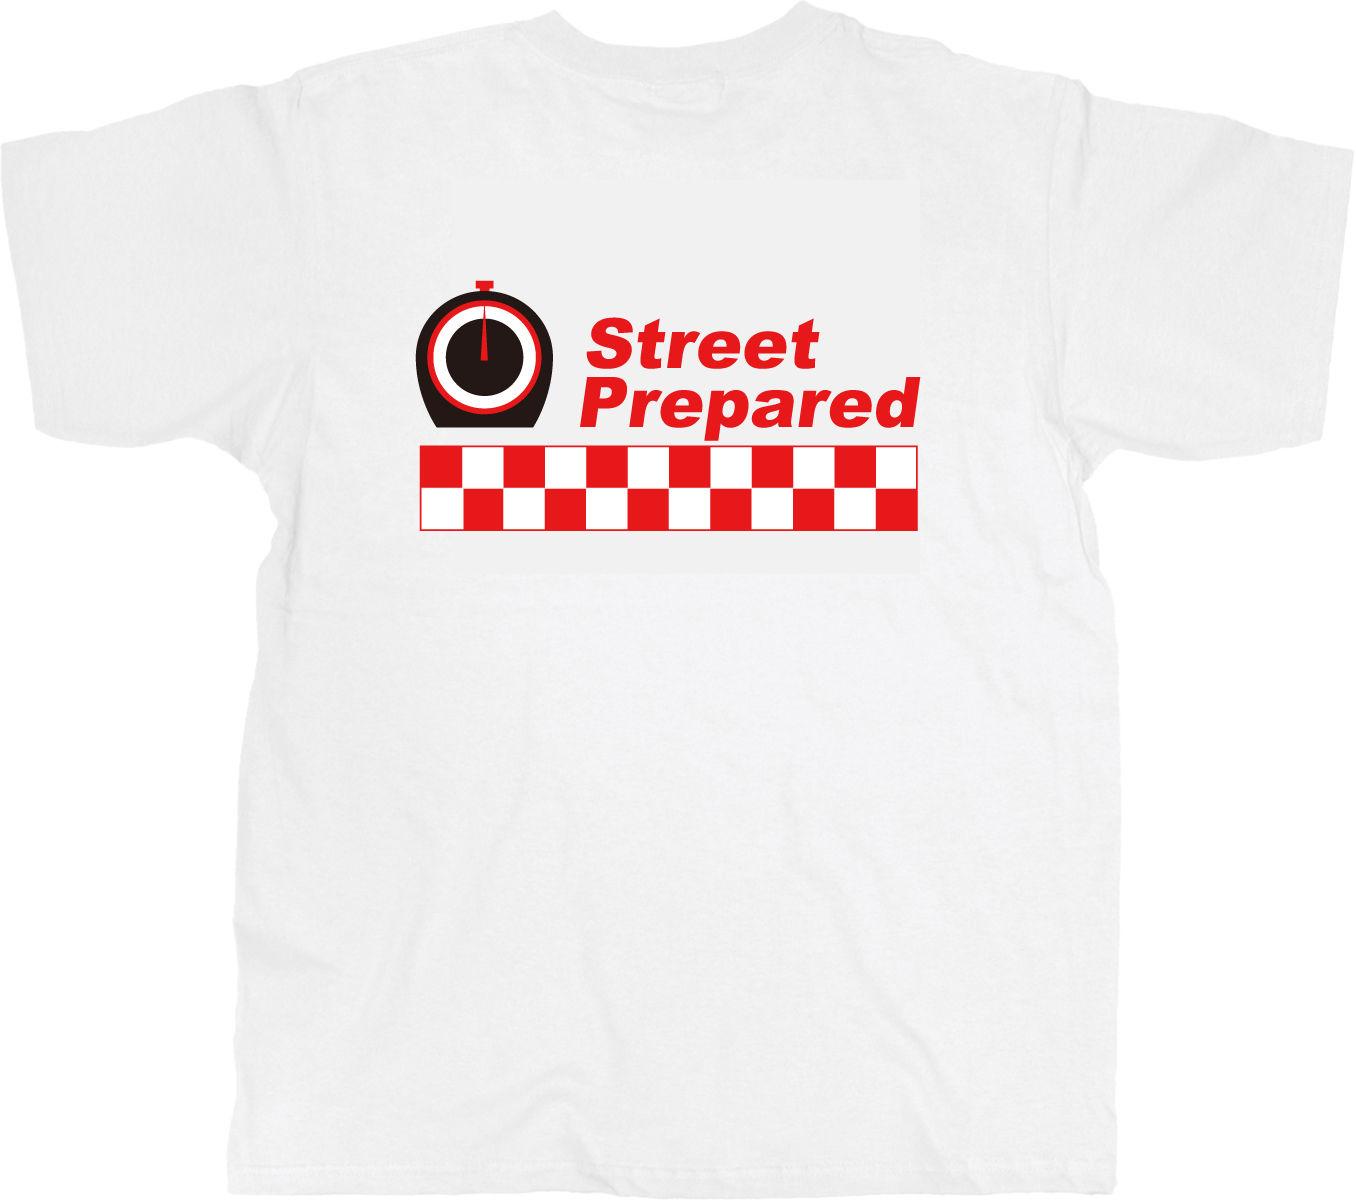 SP001  Street Prepared logo T-shirt